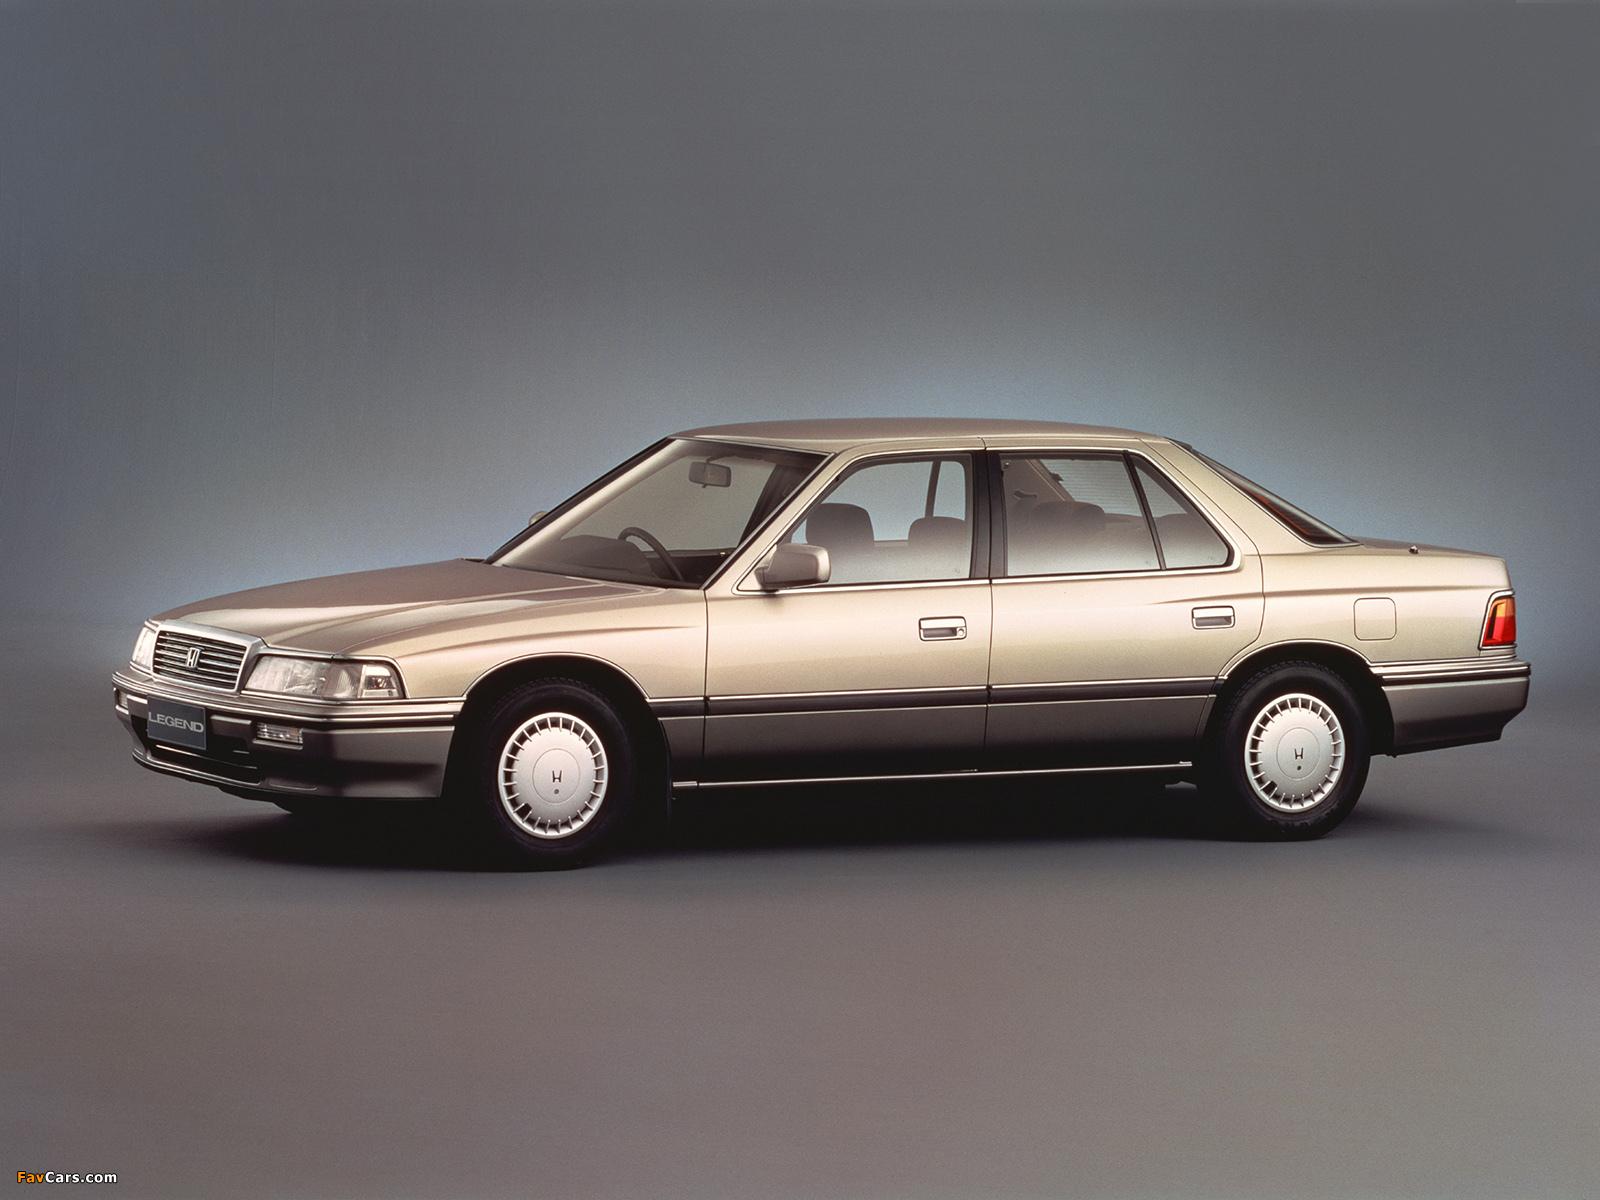 Images of Honda Legend V6 Gi 1985-90 (1600x1200)